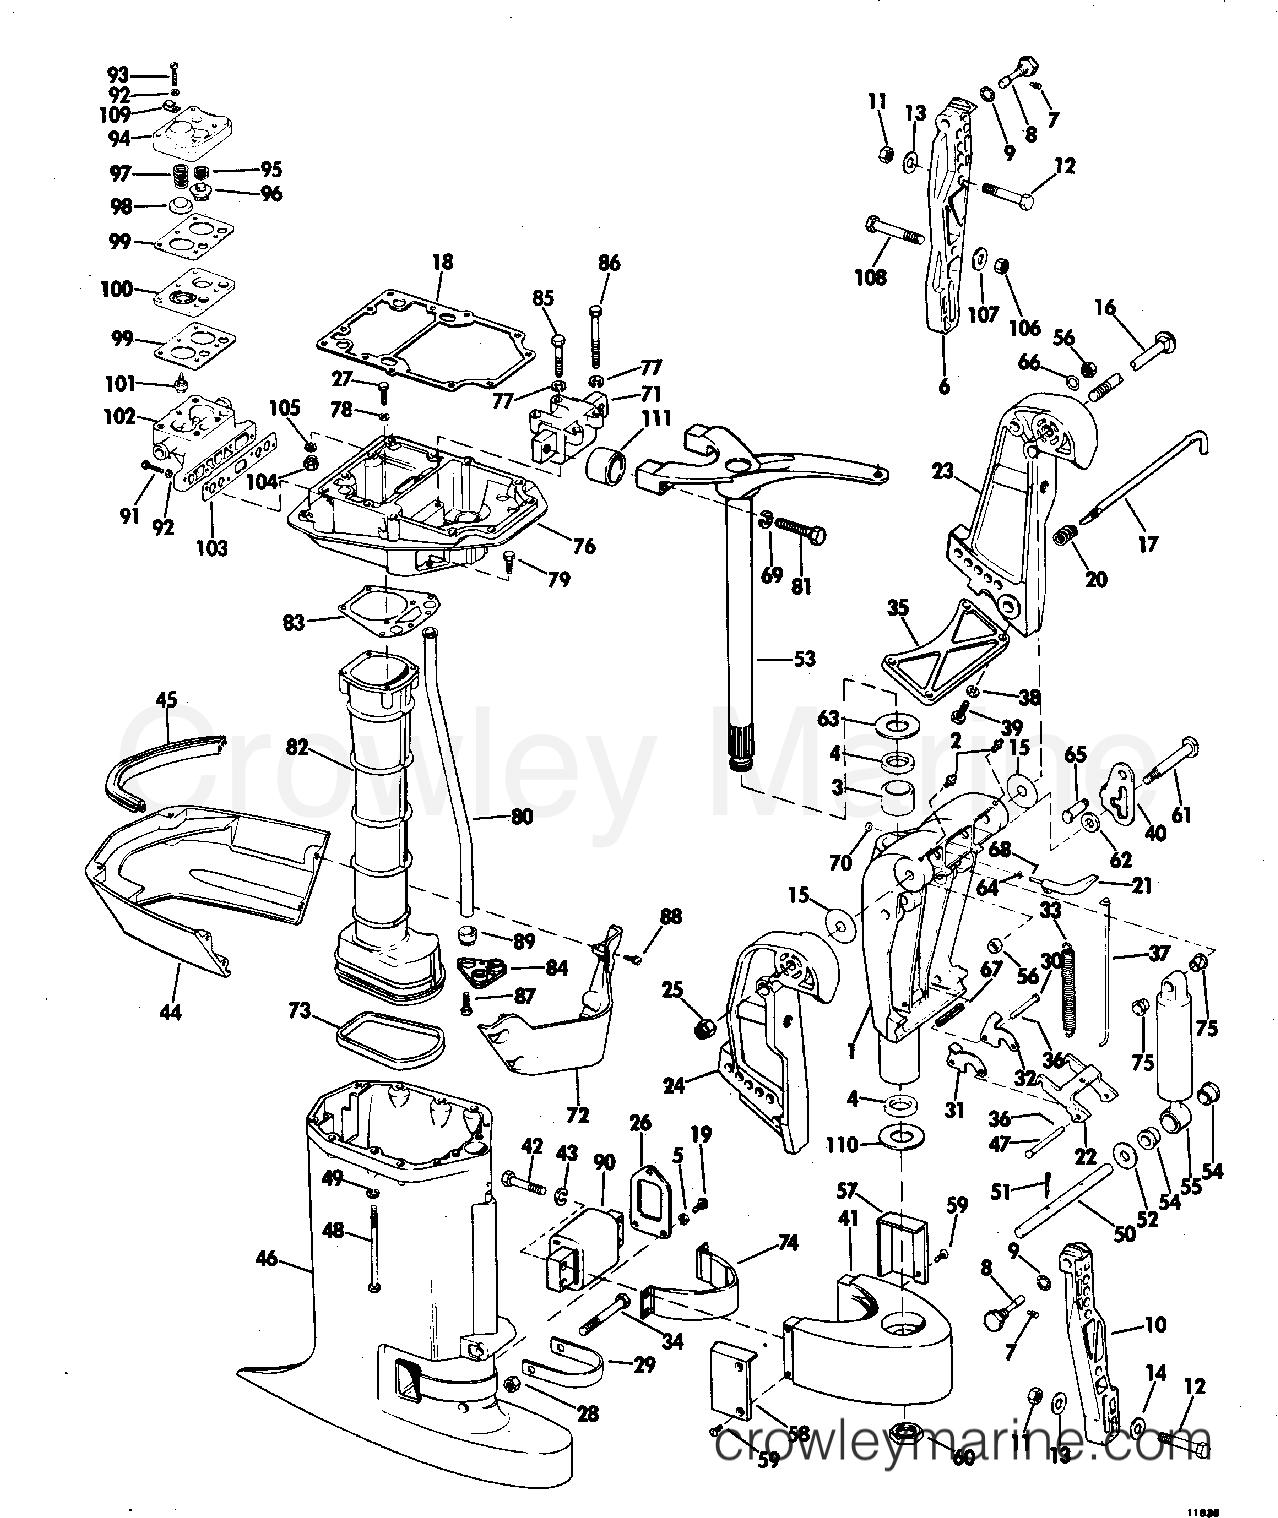 Gz 6736 Diagram Of 1971 125esl71c Johnson Outboard Motor Cover Diagram And Download Diagram